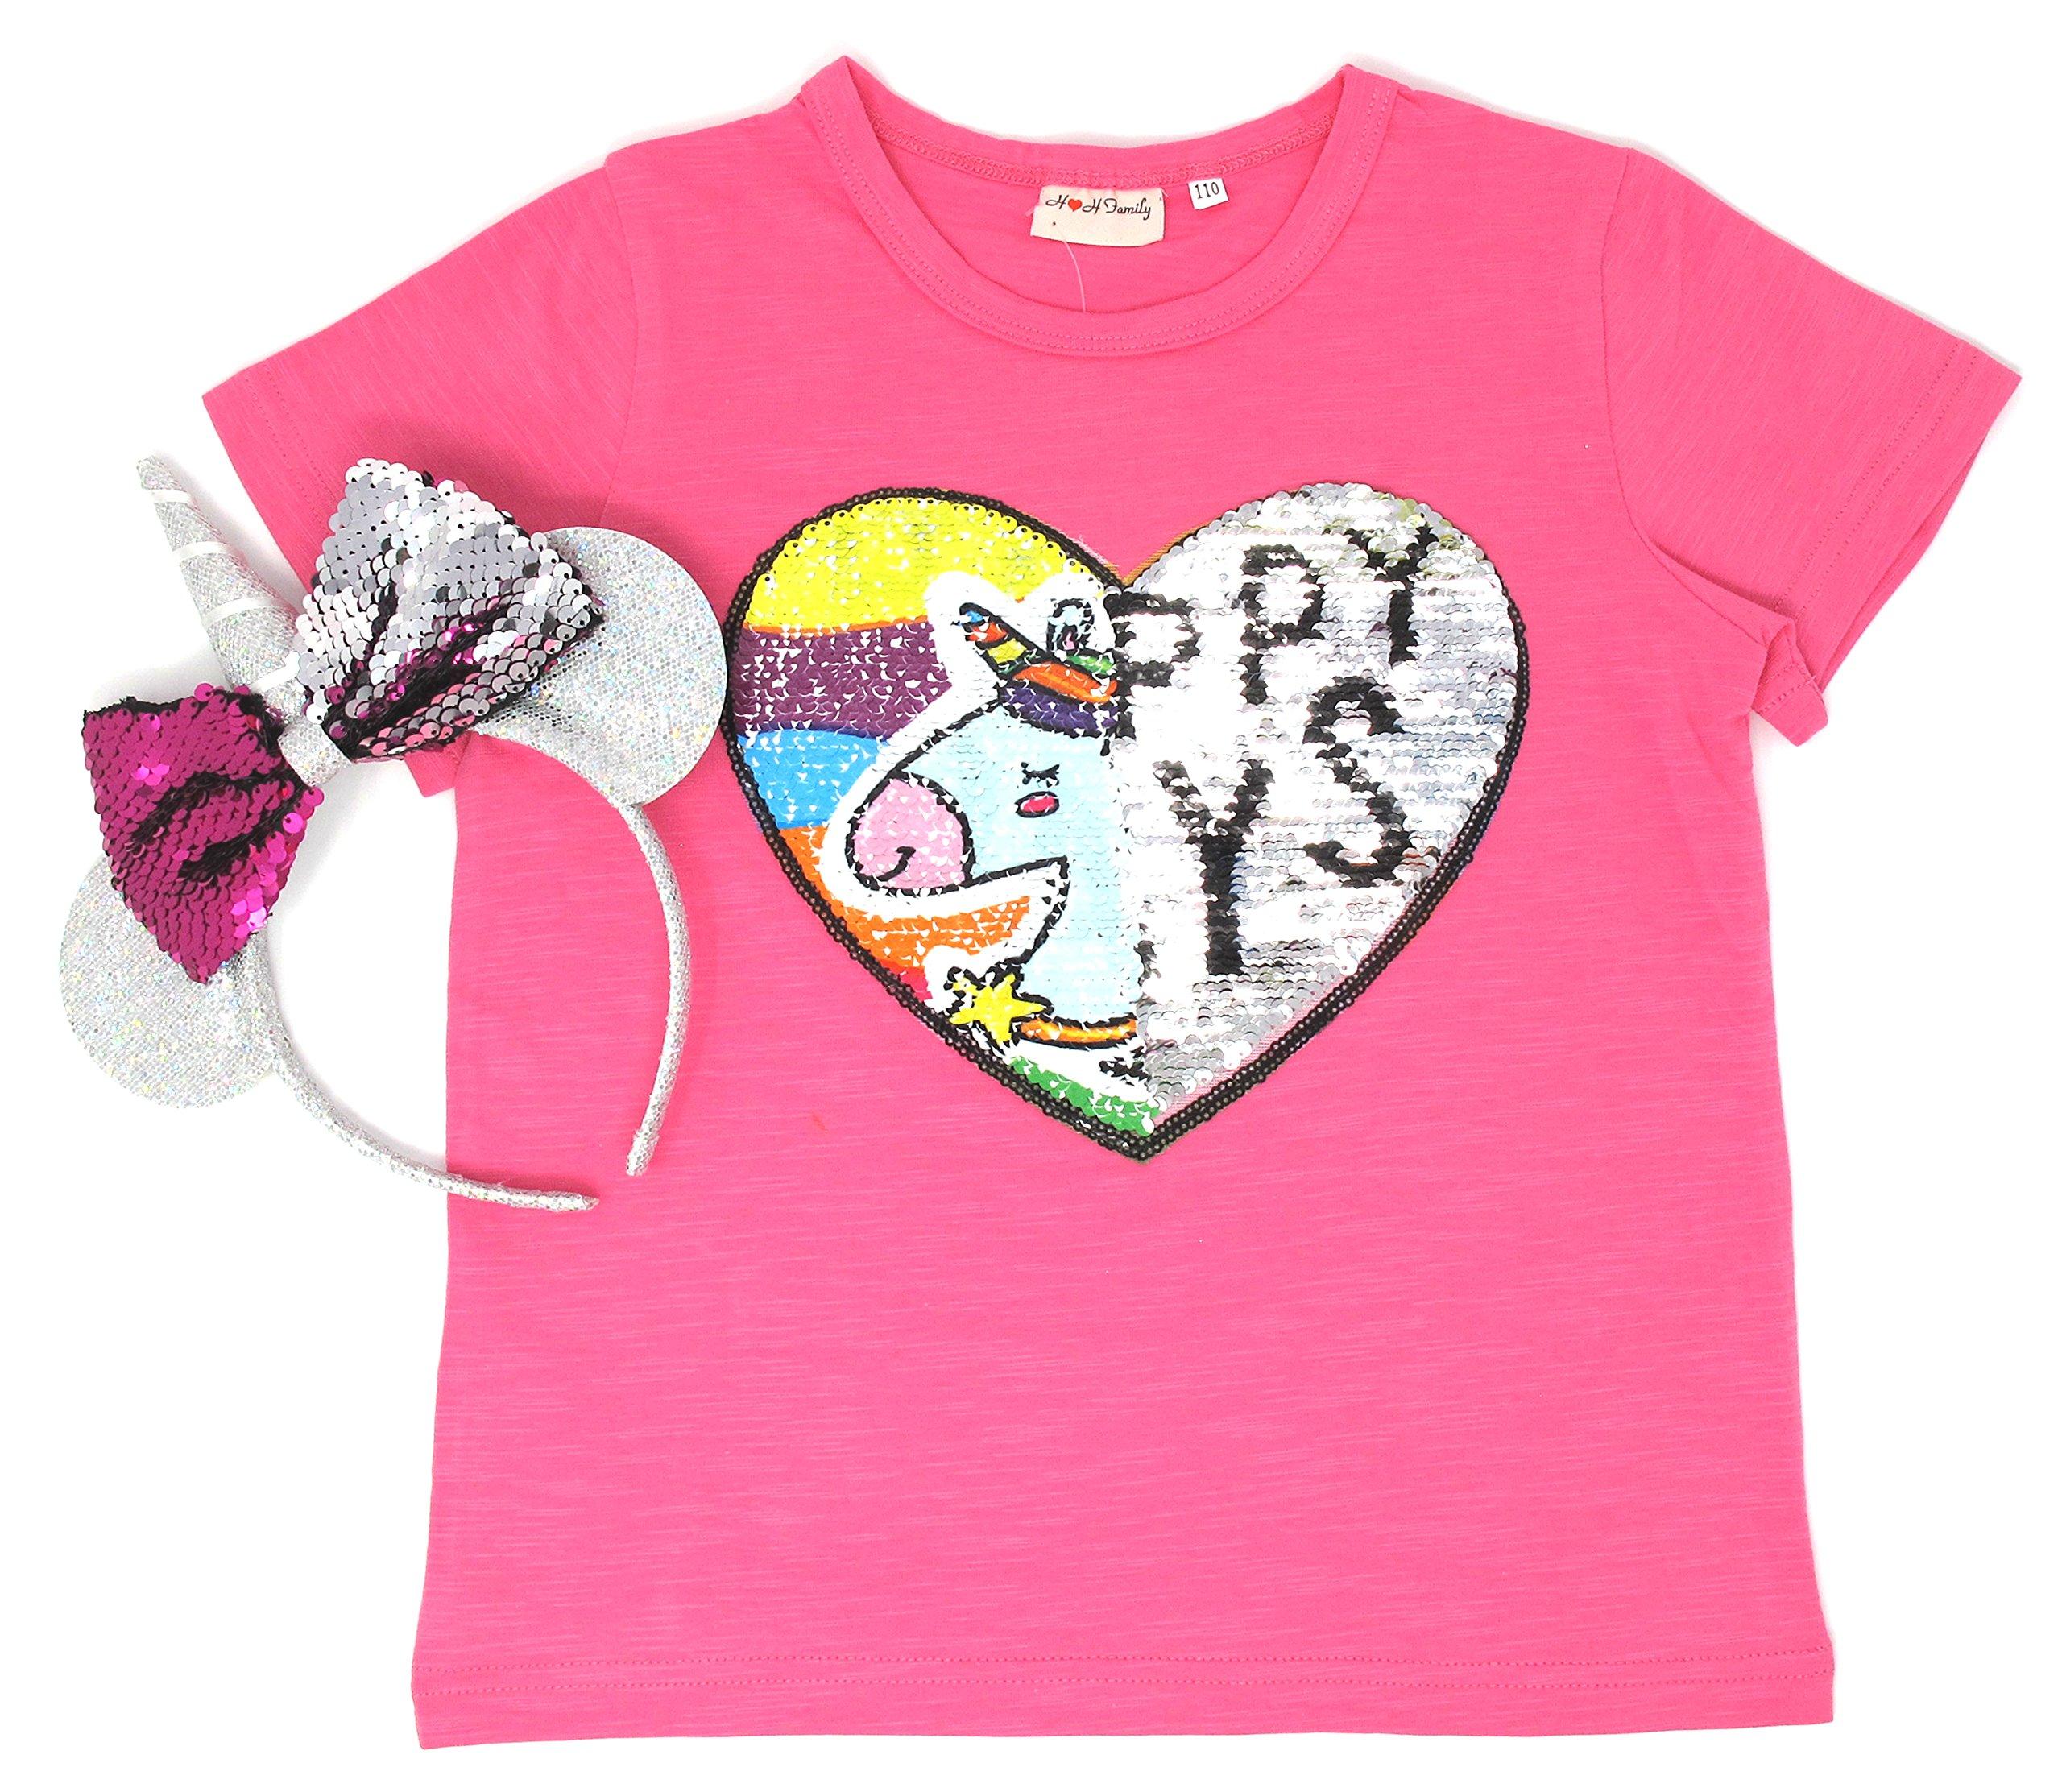 Unicorn Flip Heart Sequin Girl's T-Shirt with Flip Sequin Unicorn Headband 4-12 Years (6-7, Hot Pink+Headband)